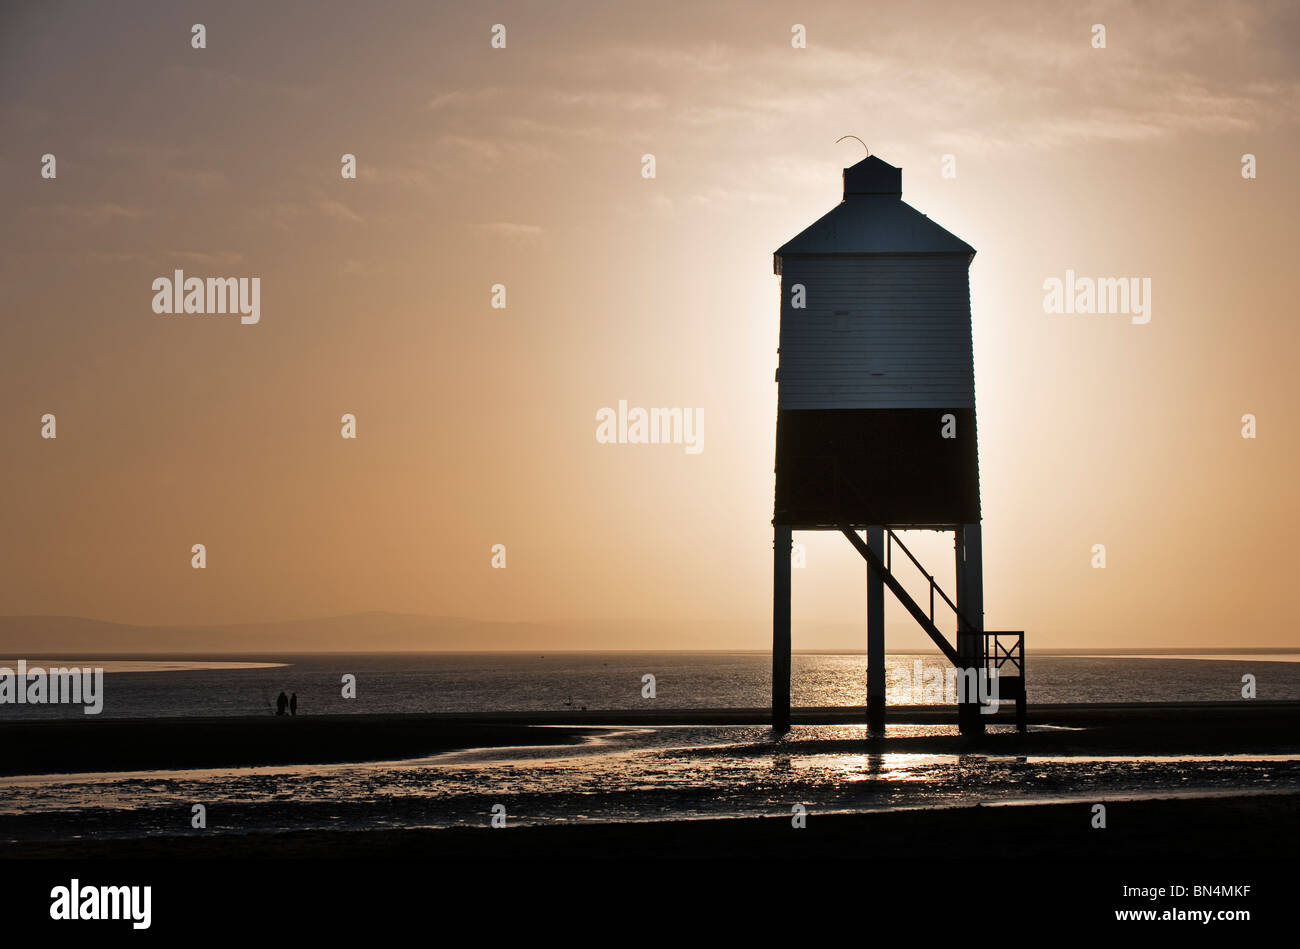 Burnham lighthouse at sunset - Stock Image